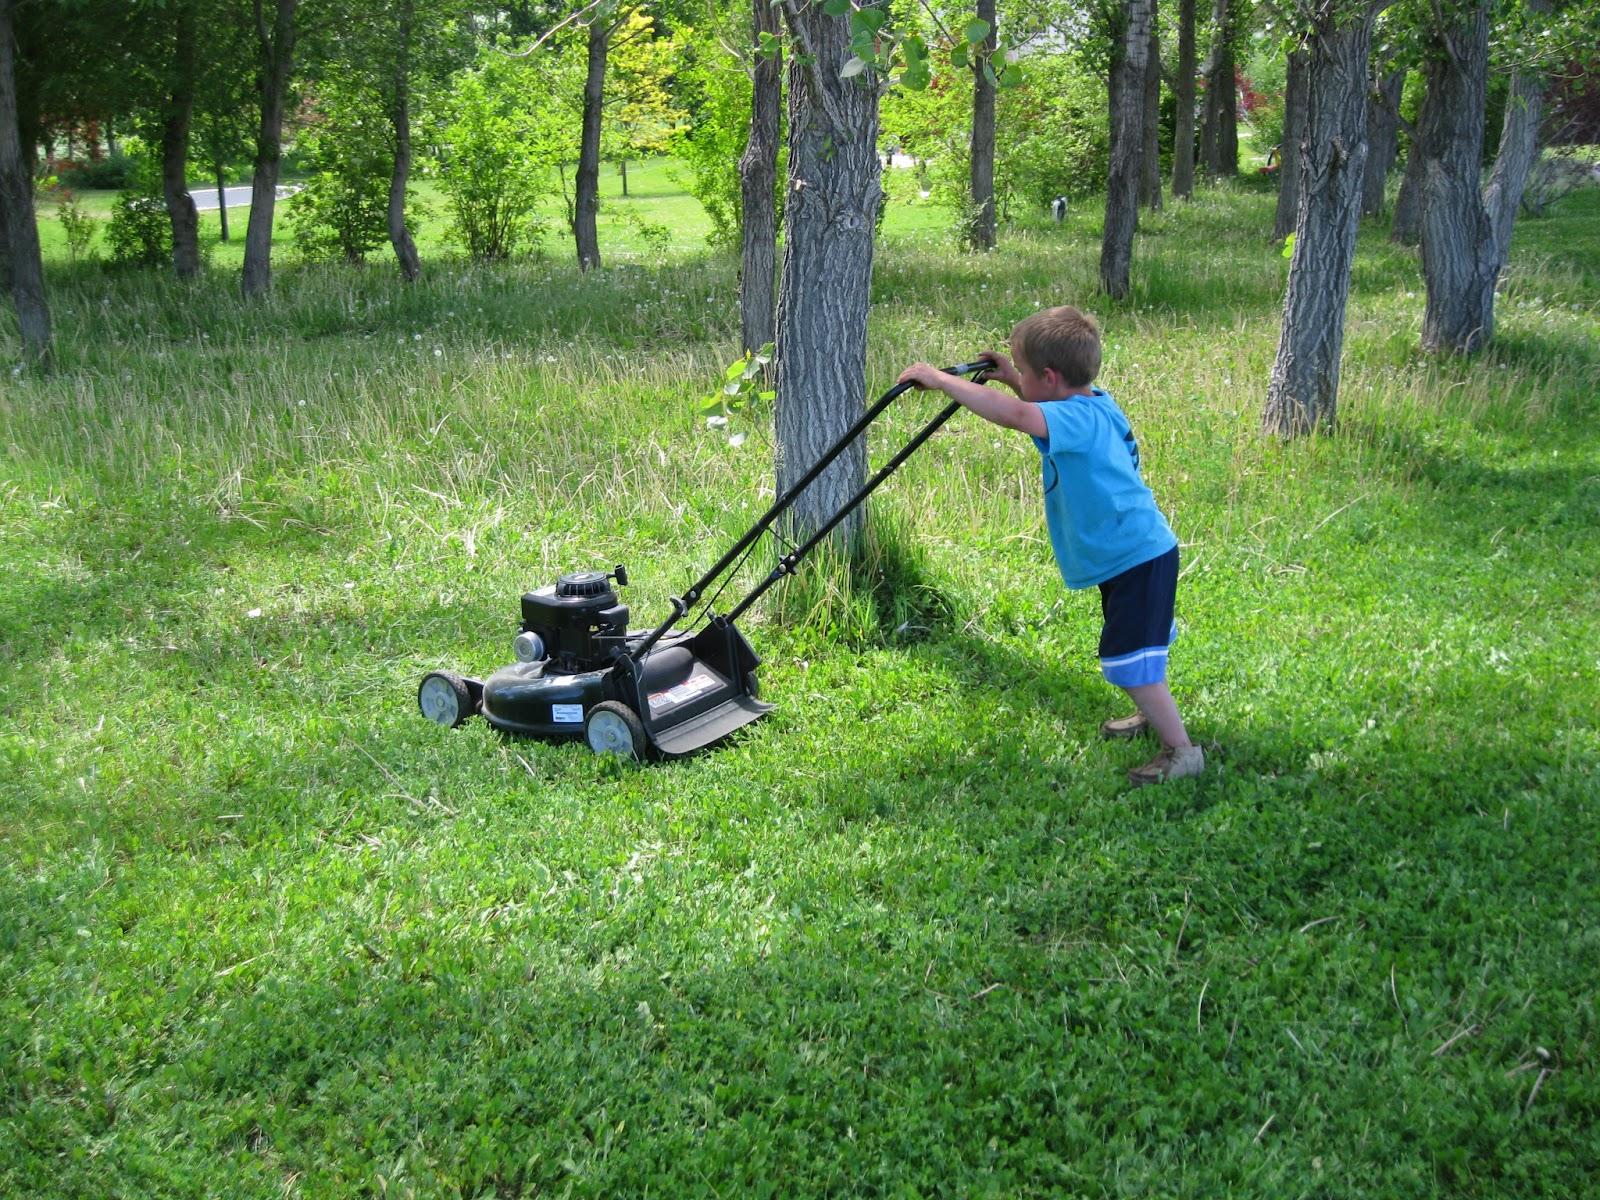 http://2.bp.blogspot.com/-WJN3B4VLYTk/T-zoQmmnYOI/AAAAAAAACg8/-BKkvP8NRQY/s1600/Joseph+Mowing+Lawn+2.jpg